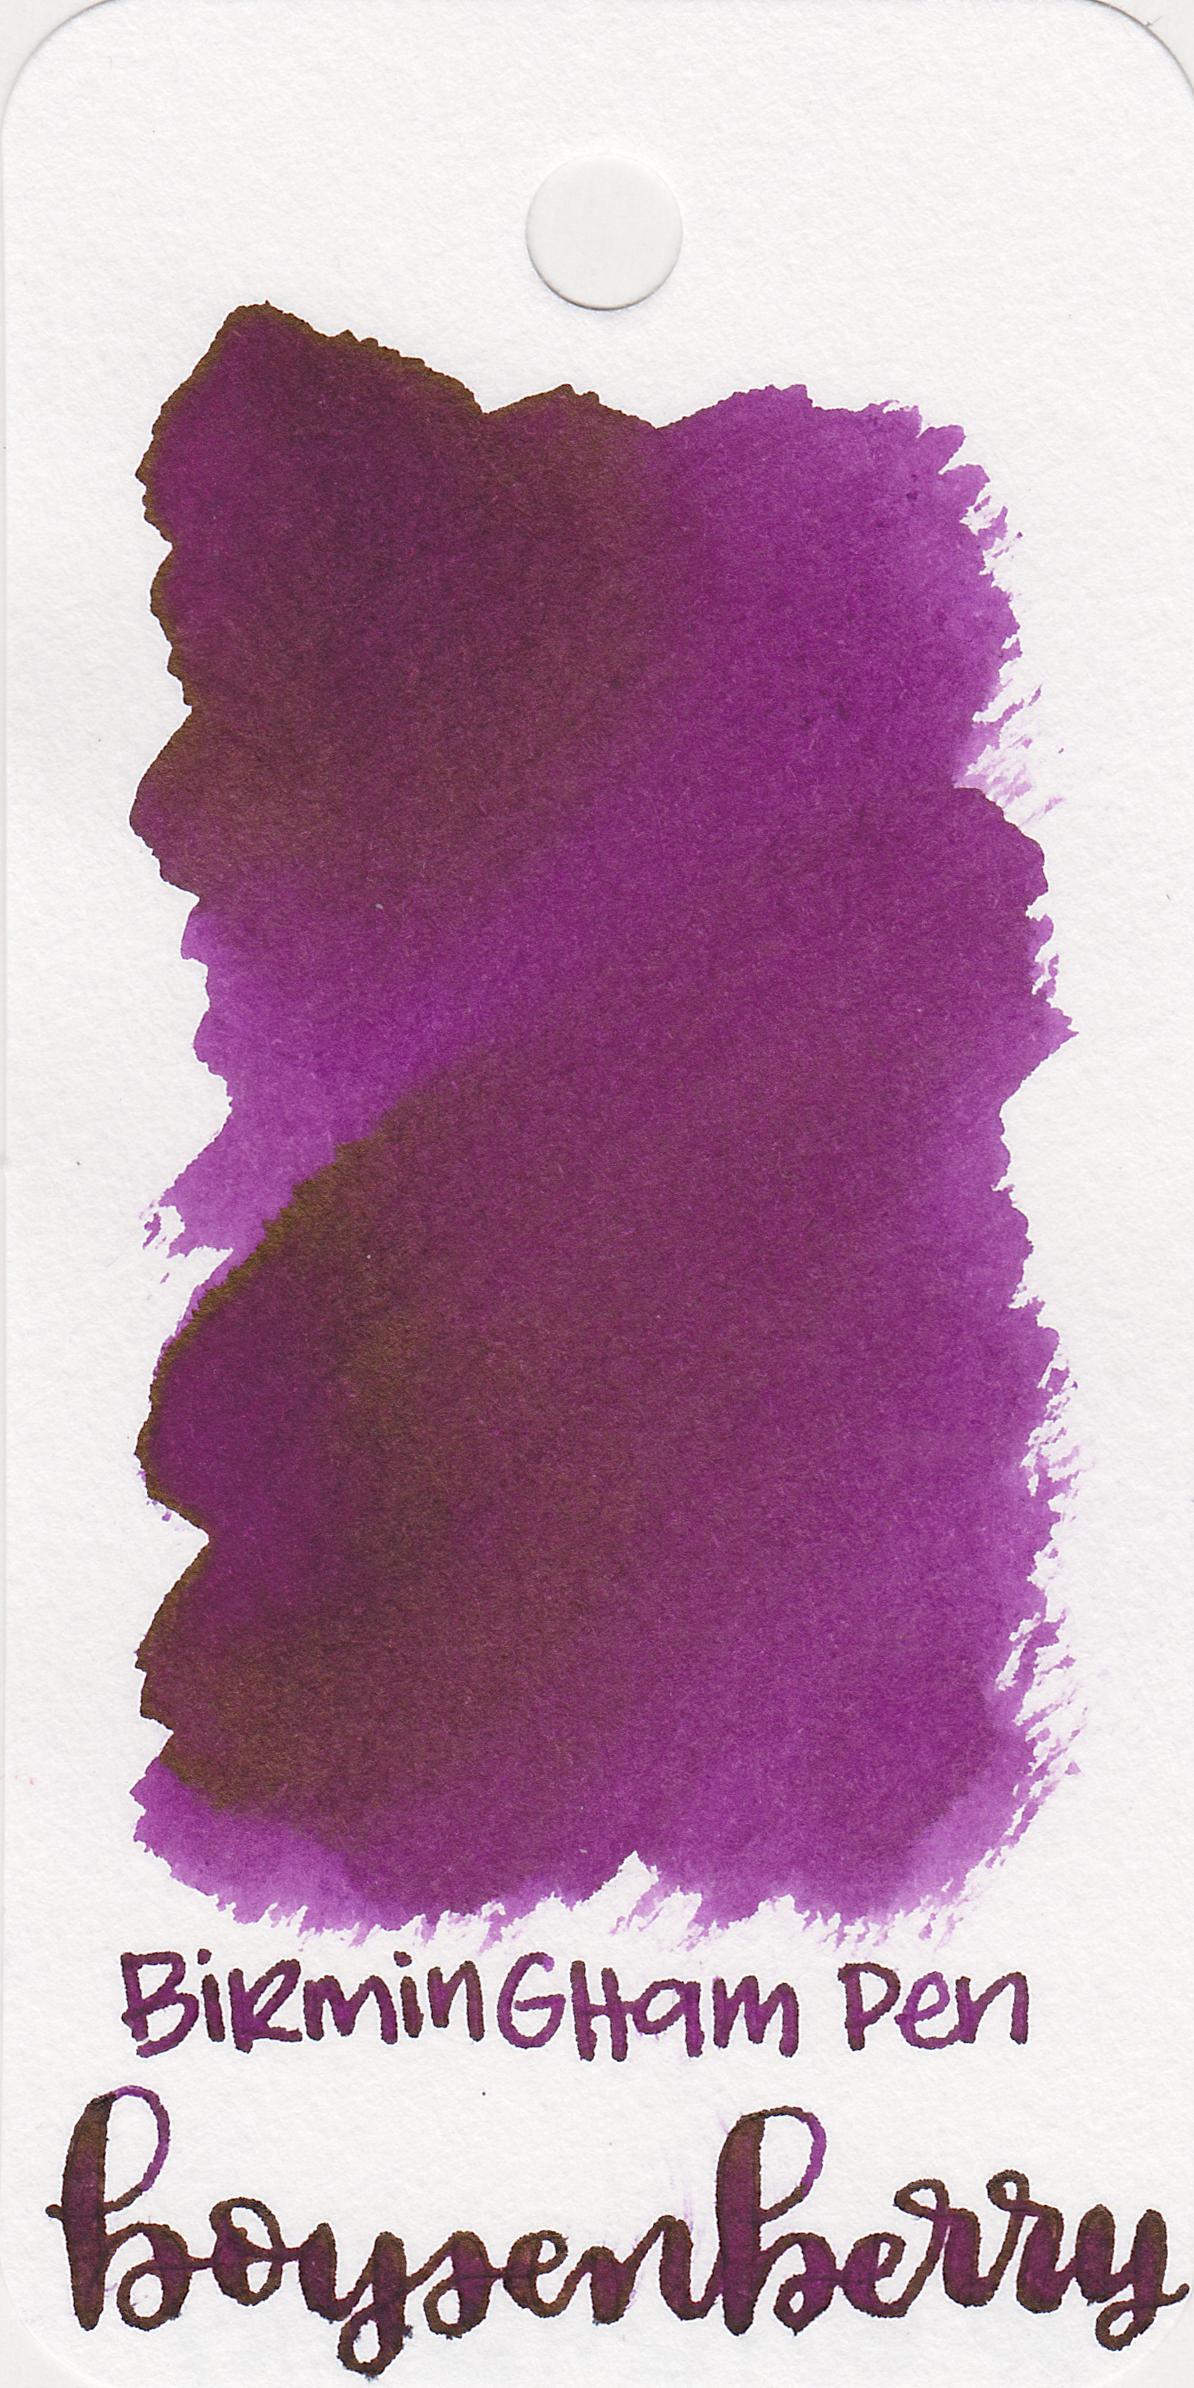 bp-boysenberry-1.jpg